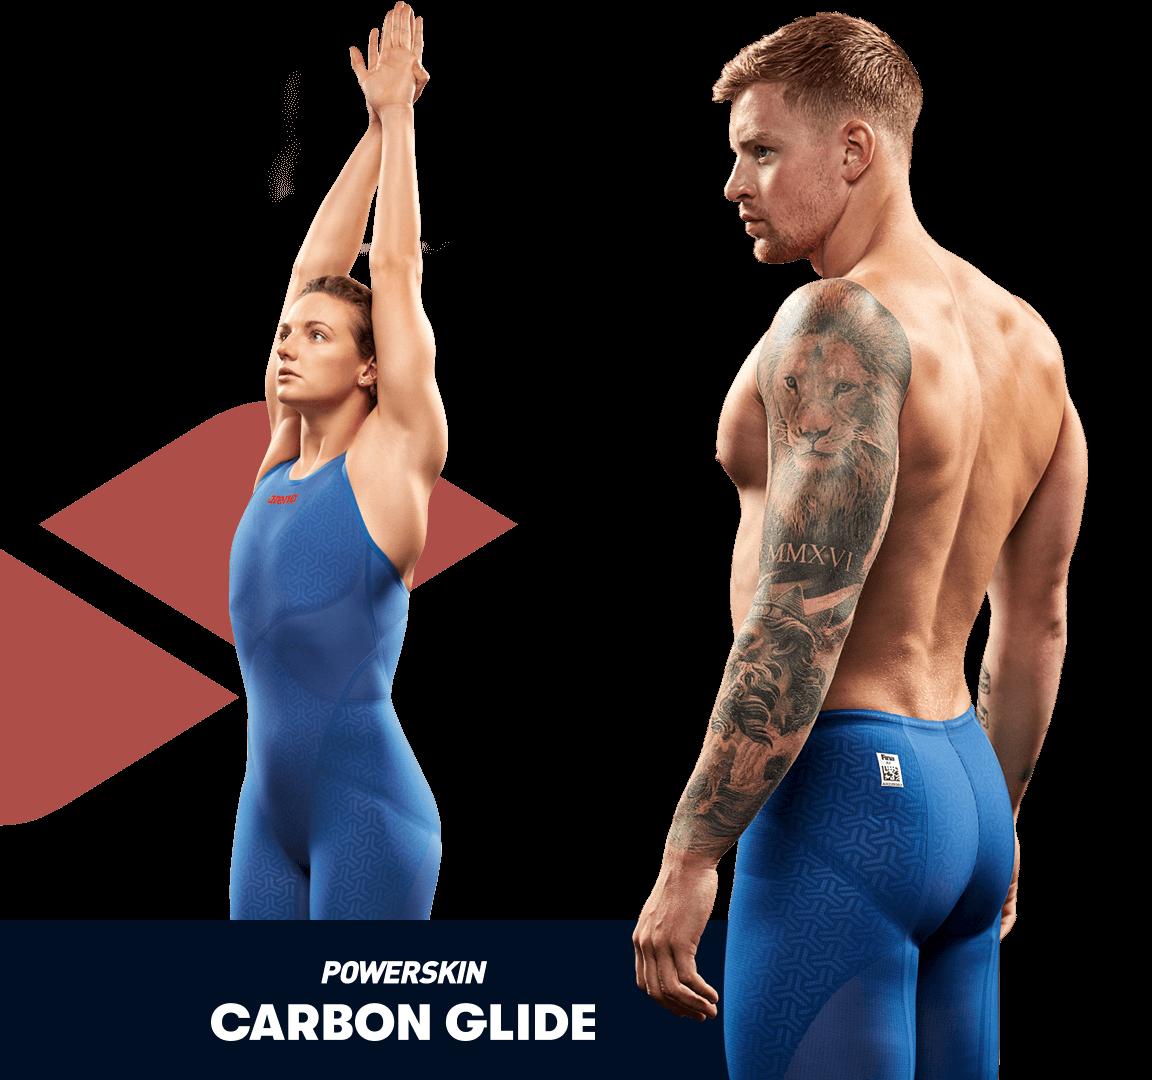 arena Powerskin Carbon Glide race suit